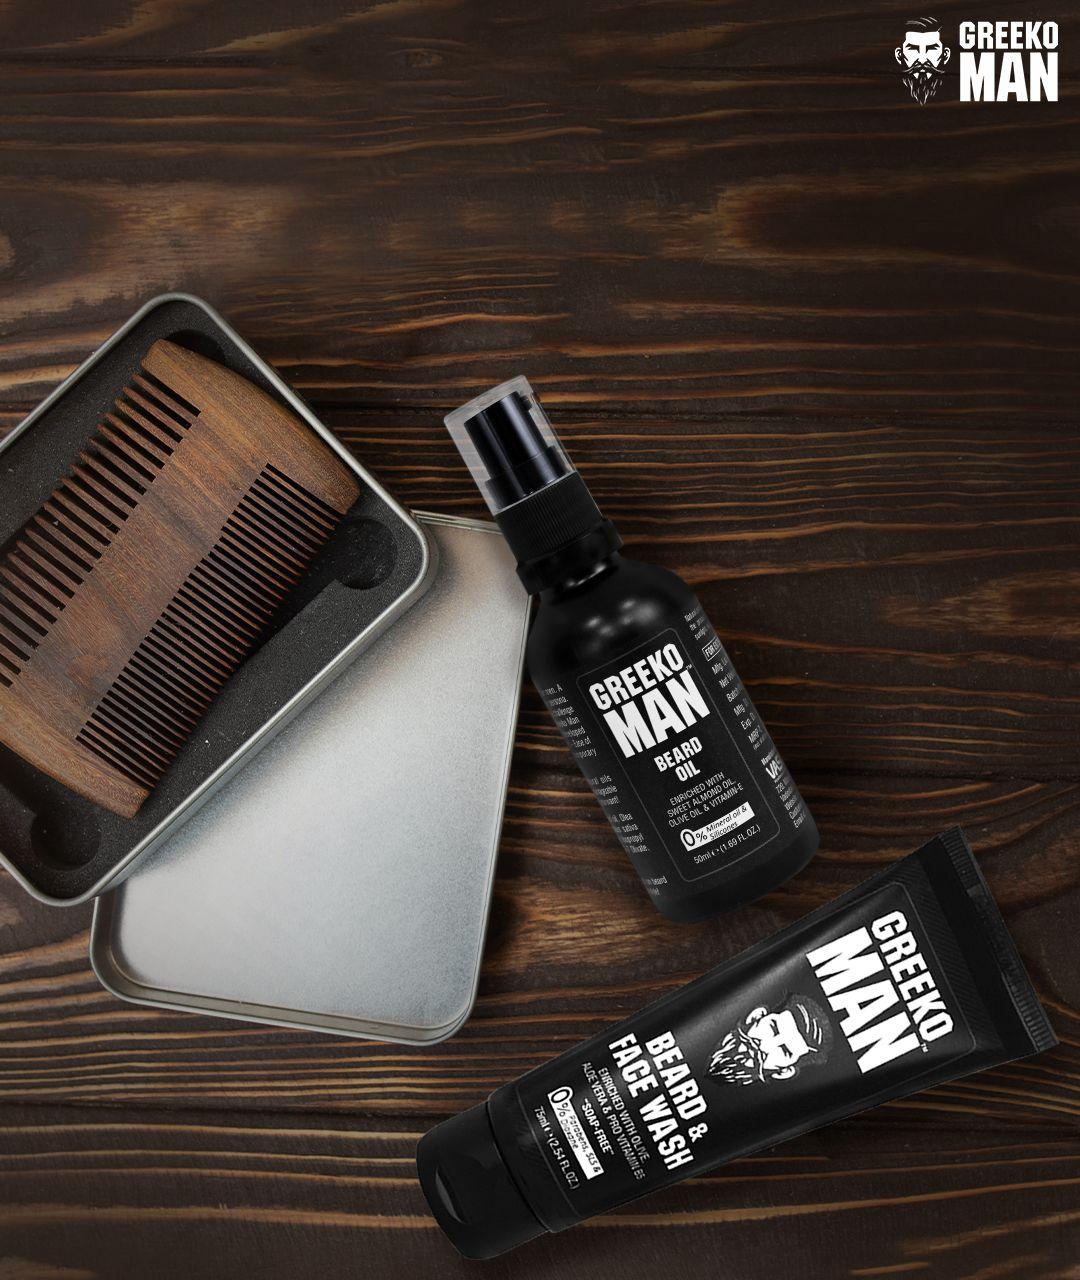 Make Your Beard Healthy & Stylish  #BeardKing #GreekoMan #MensGrooming #beard #BeardCare #beards #beardstyle #beardgang #beardlife #beardedmen #style #beardman #beardlove